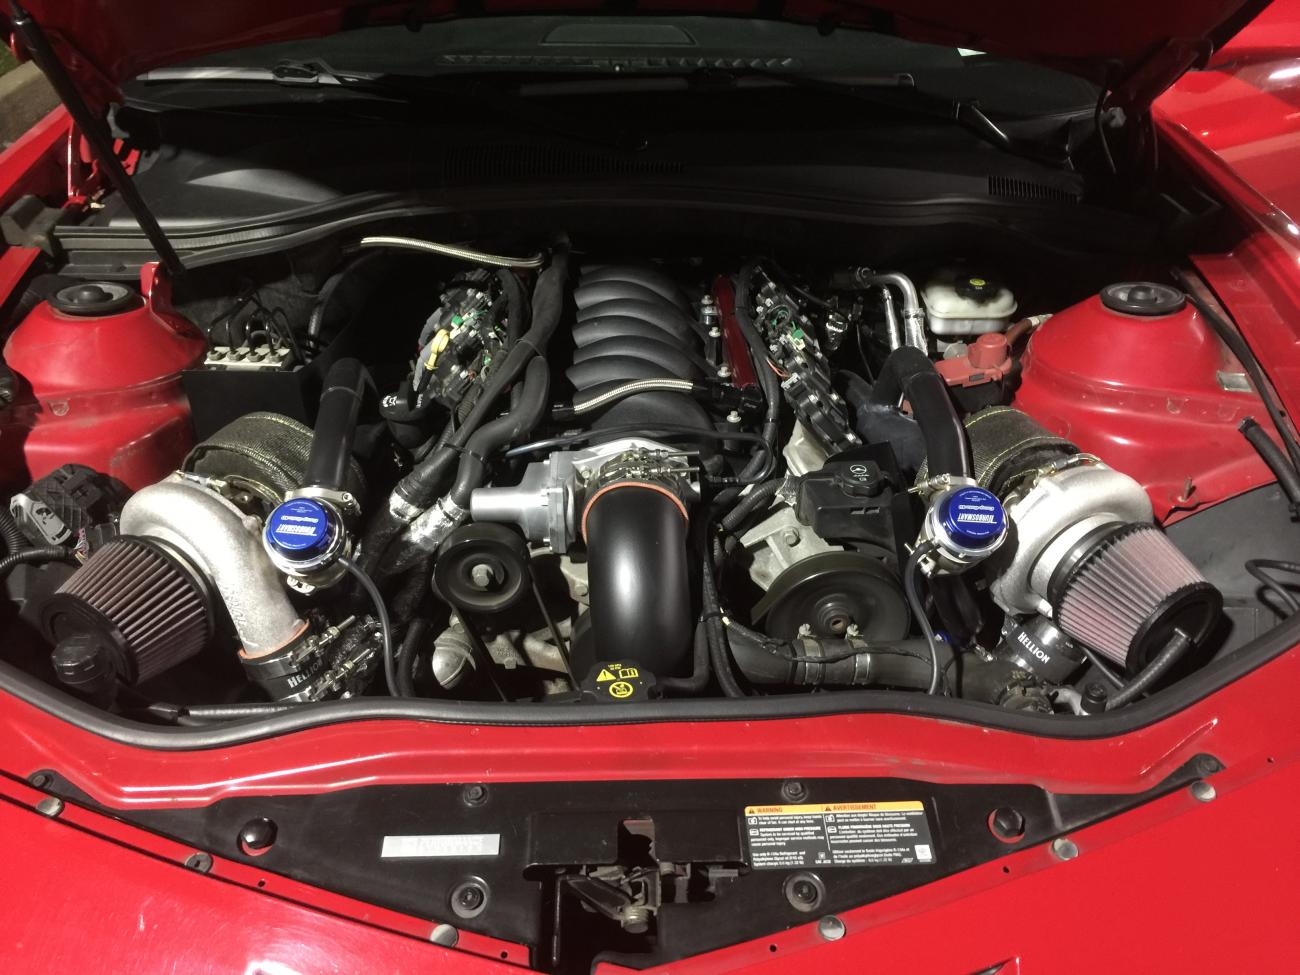 Feeler Hellion Twin Turbo Kit Camaro5 Chevy Camaro Forum